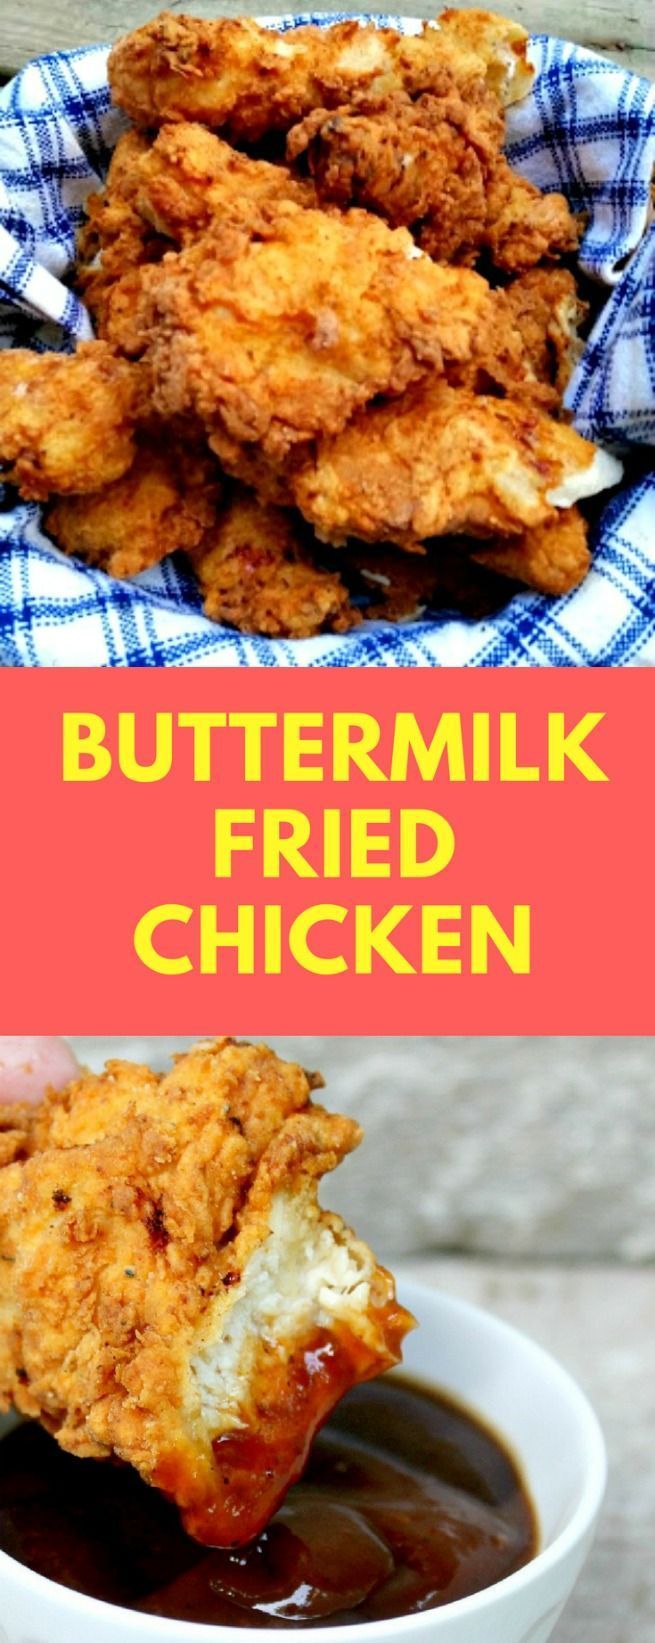 Fried chicken - Appetizer - Easy